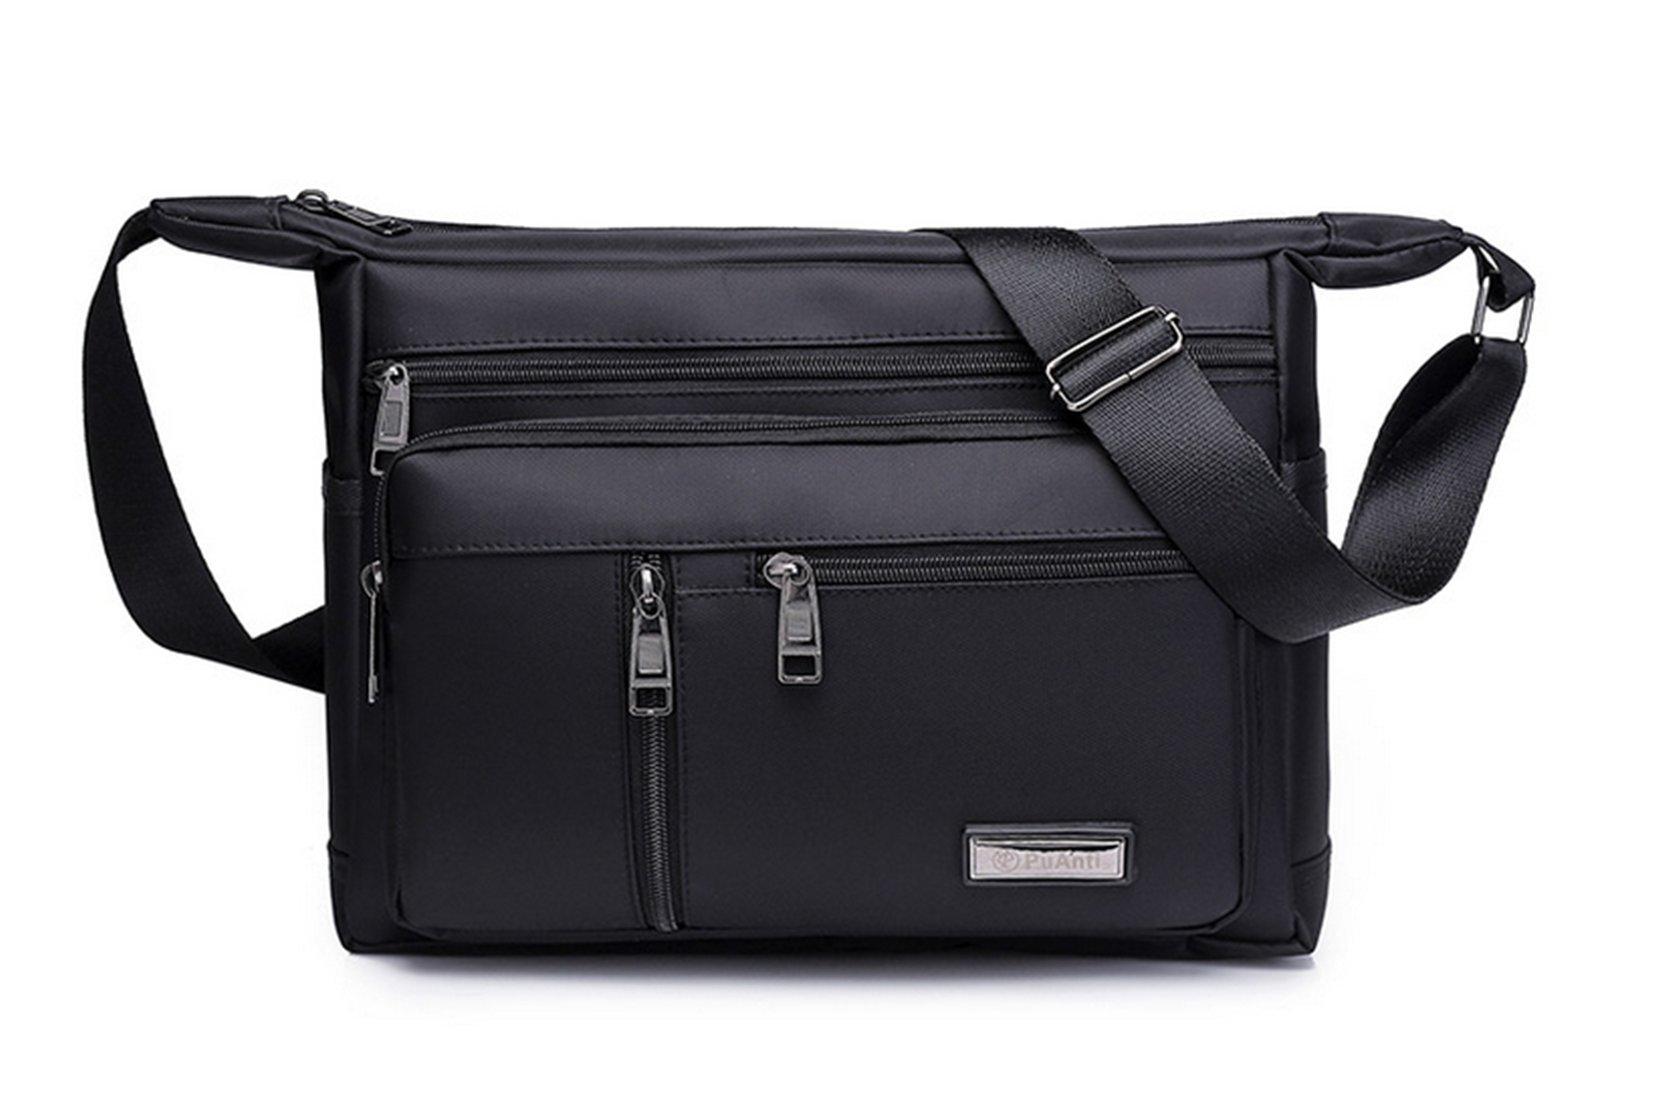 Nodykka Shoulder Crossbody Bag Mini Waterproof Nylon Messenger Backpack Purse Tote Satchel Handbags for Men Women